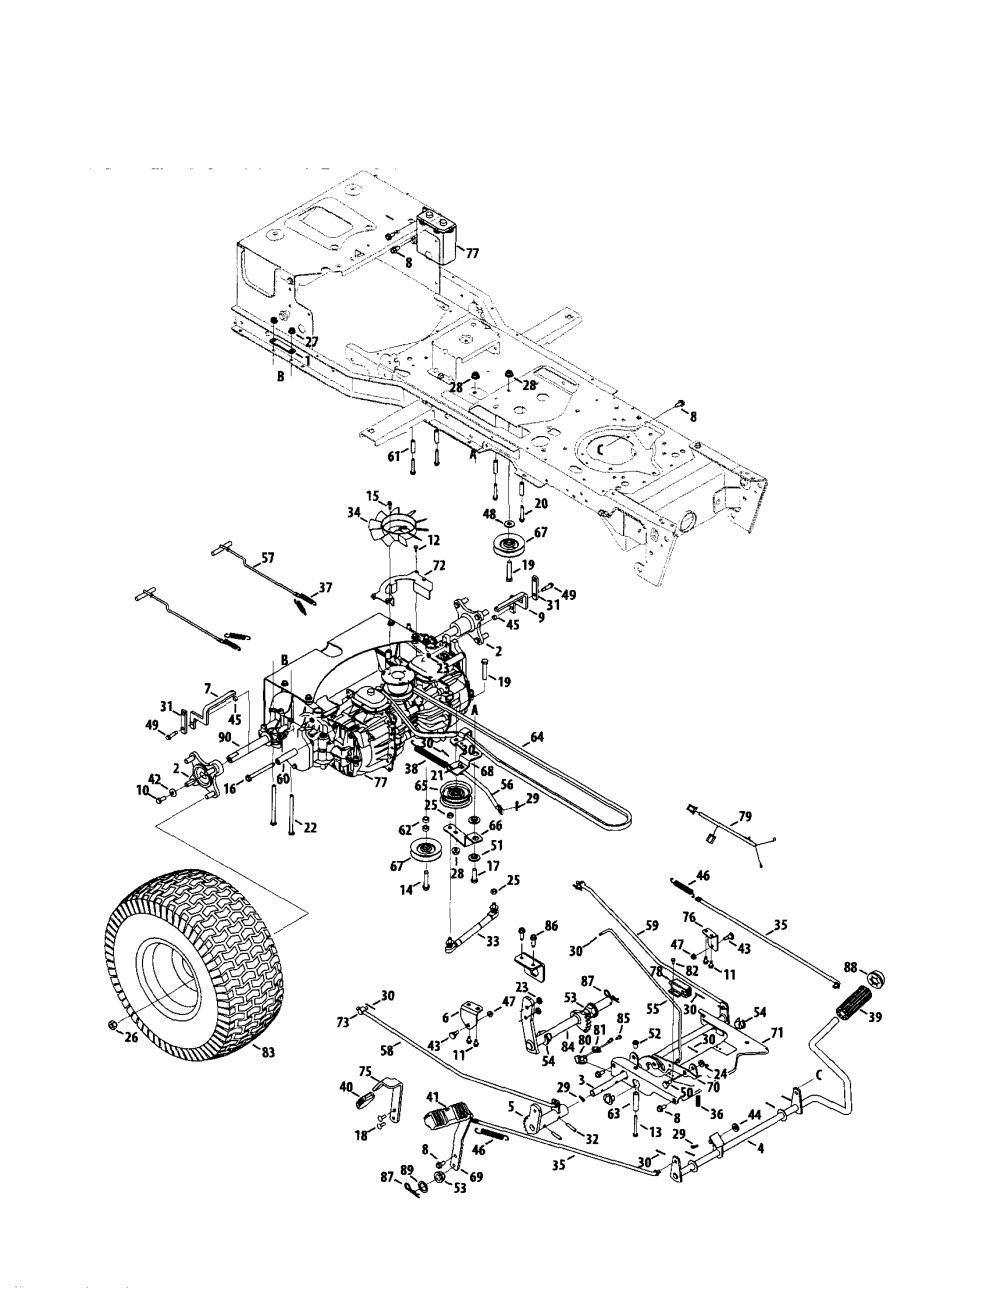 medium resolution of zero turn mower diagram wiring diagram third levelzero turn mower diagram simple wiring diagram husqvarna zero